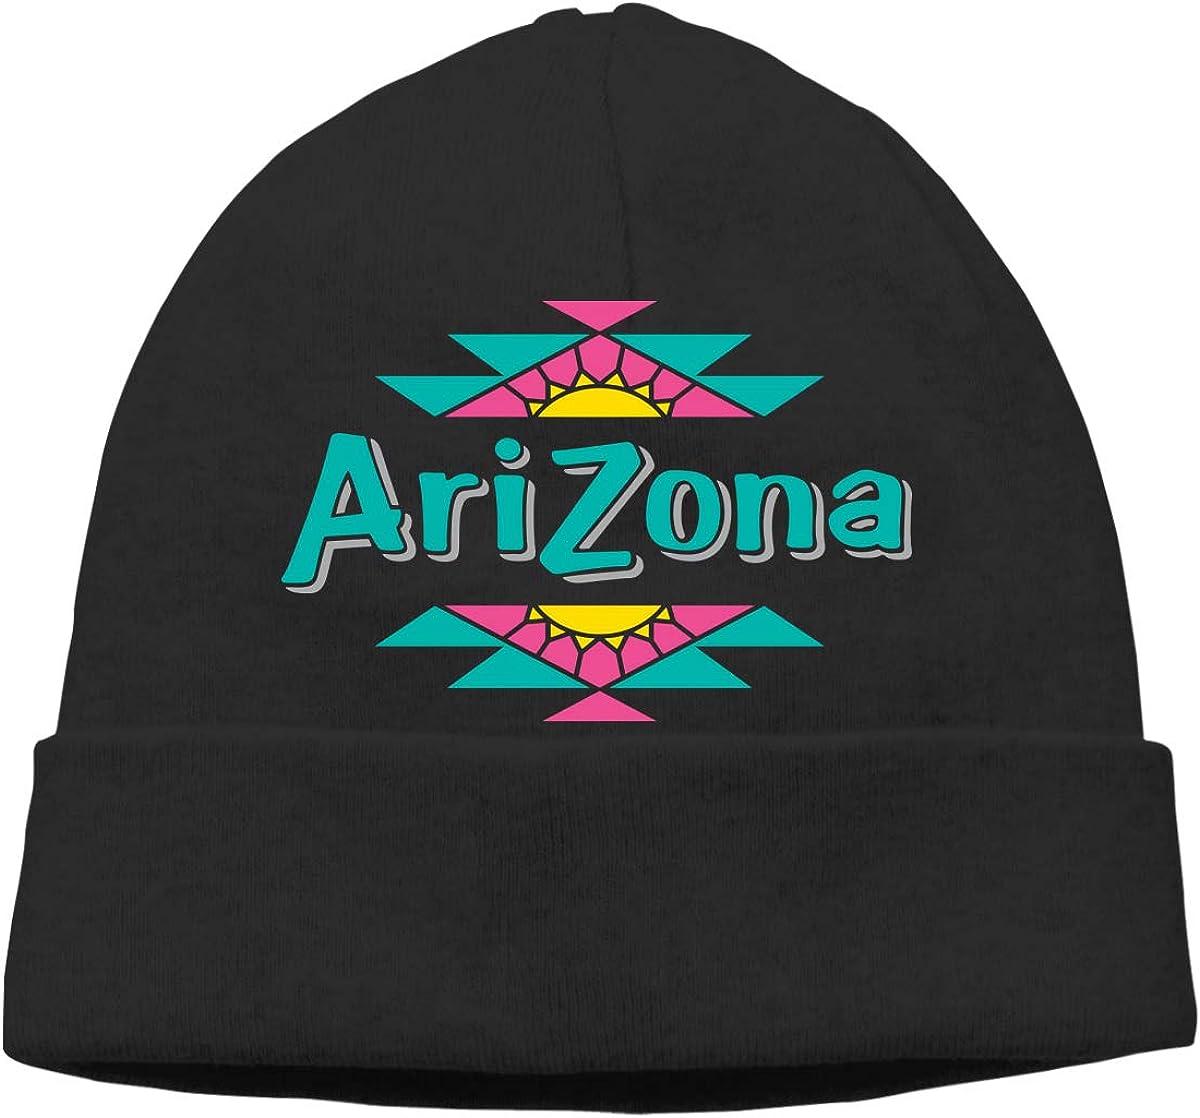 Unisex Knit Hat Arizona Wildcats License Plate Print Hats Soft Stretch Beanies Black